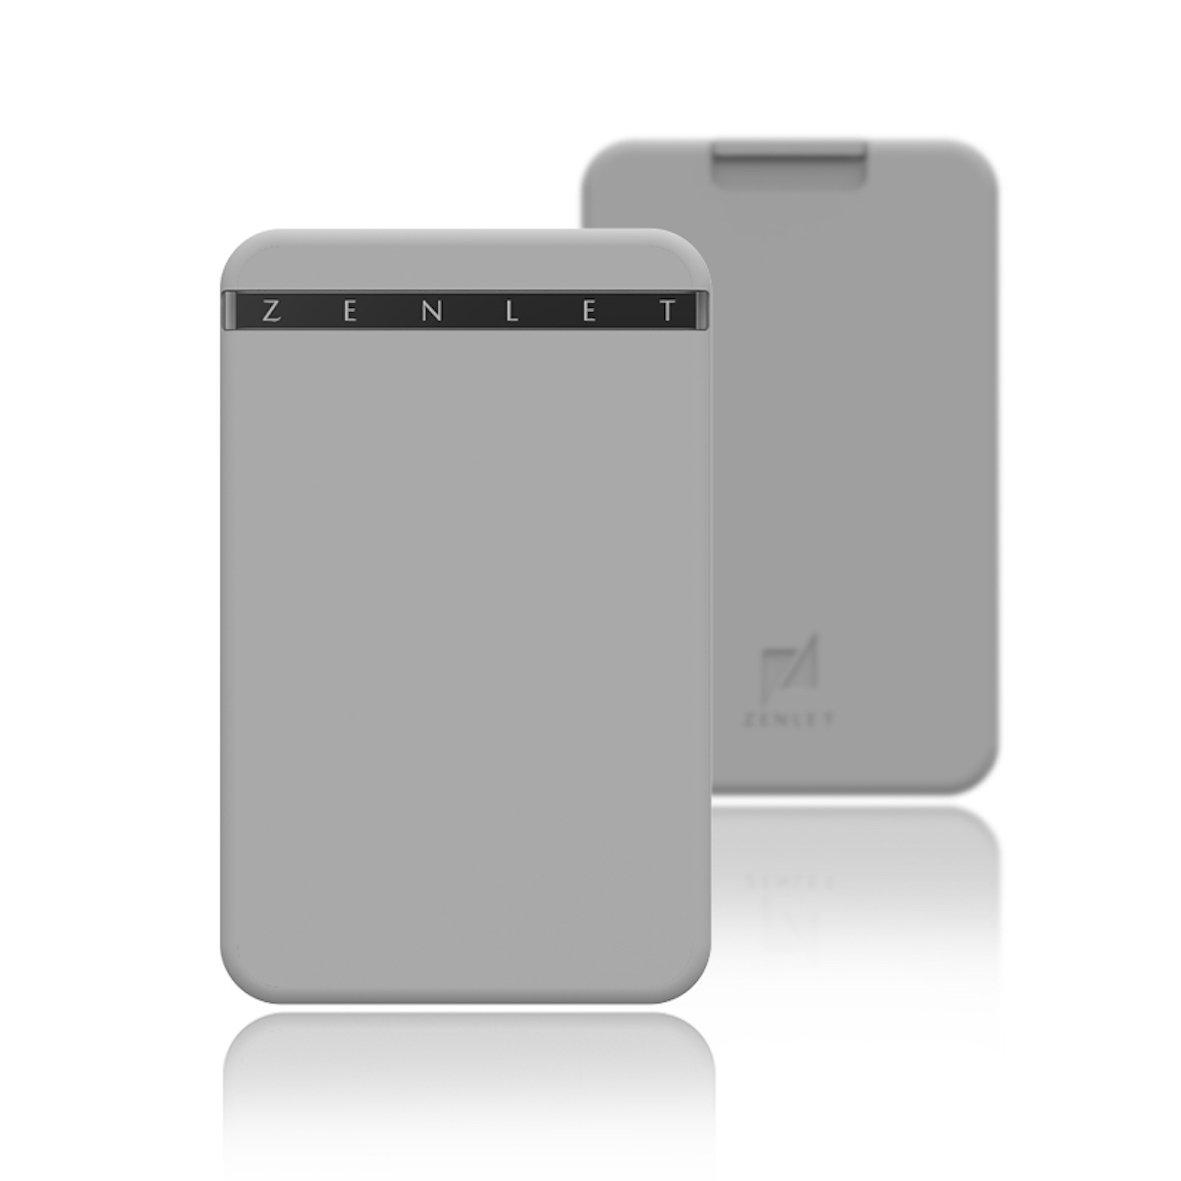 Zenletミニマリストカードウォレット 小さい財布 グッドデザイン賞 B06Y5MFVC9 セサミ セサミ